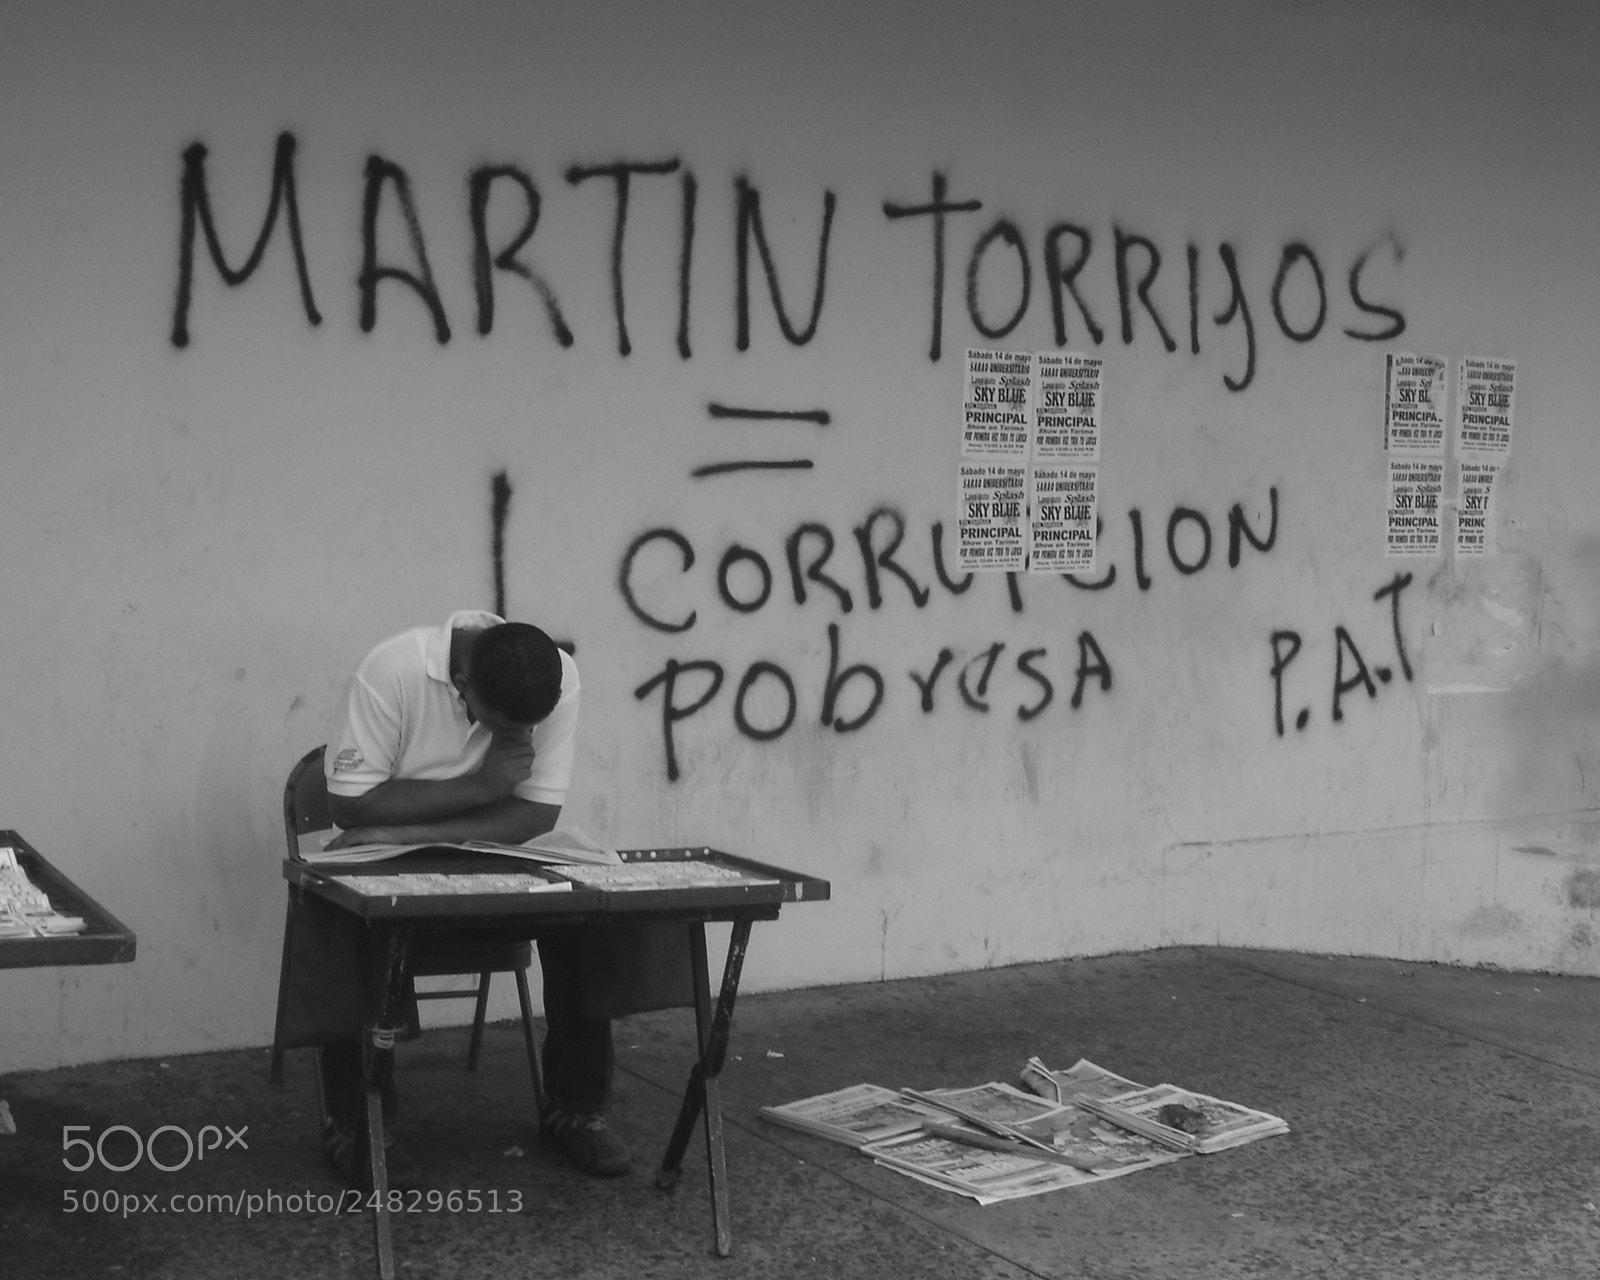 Corrupcion, Sony DSC-P73